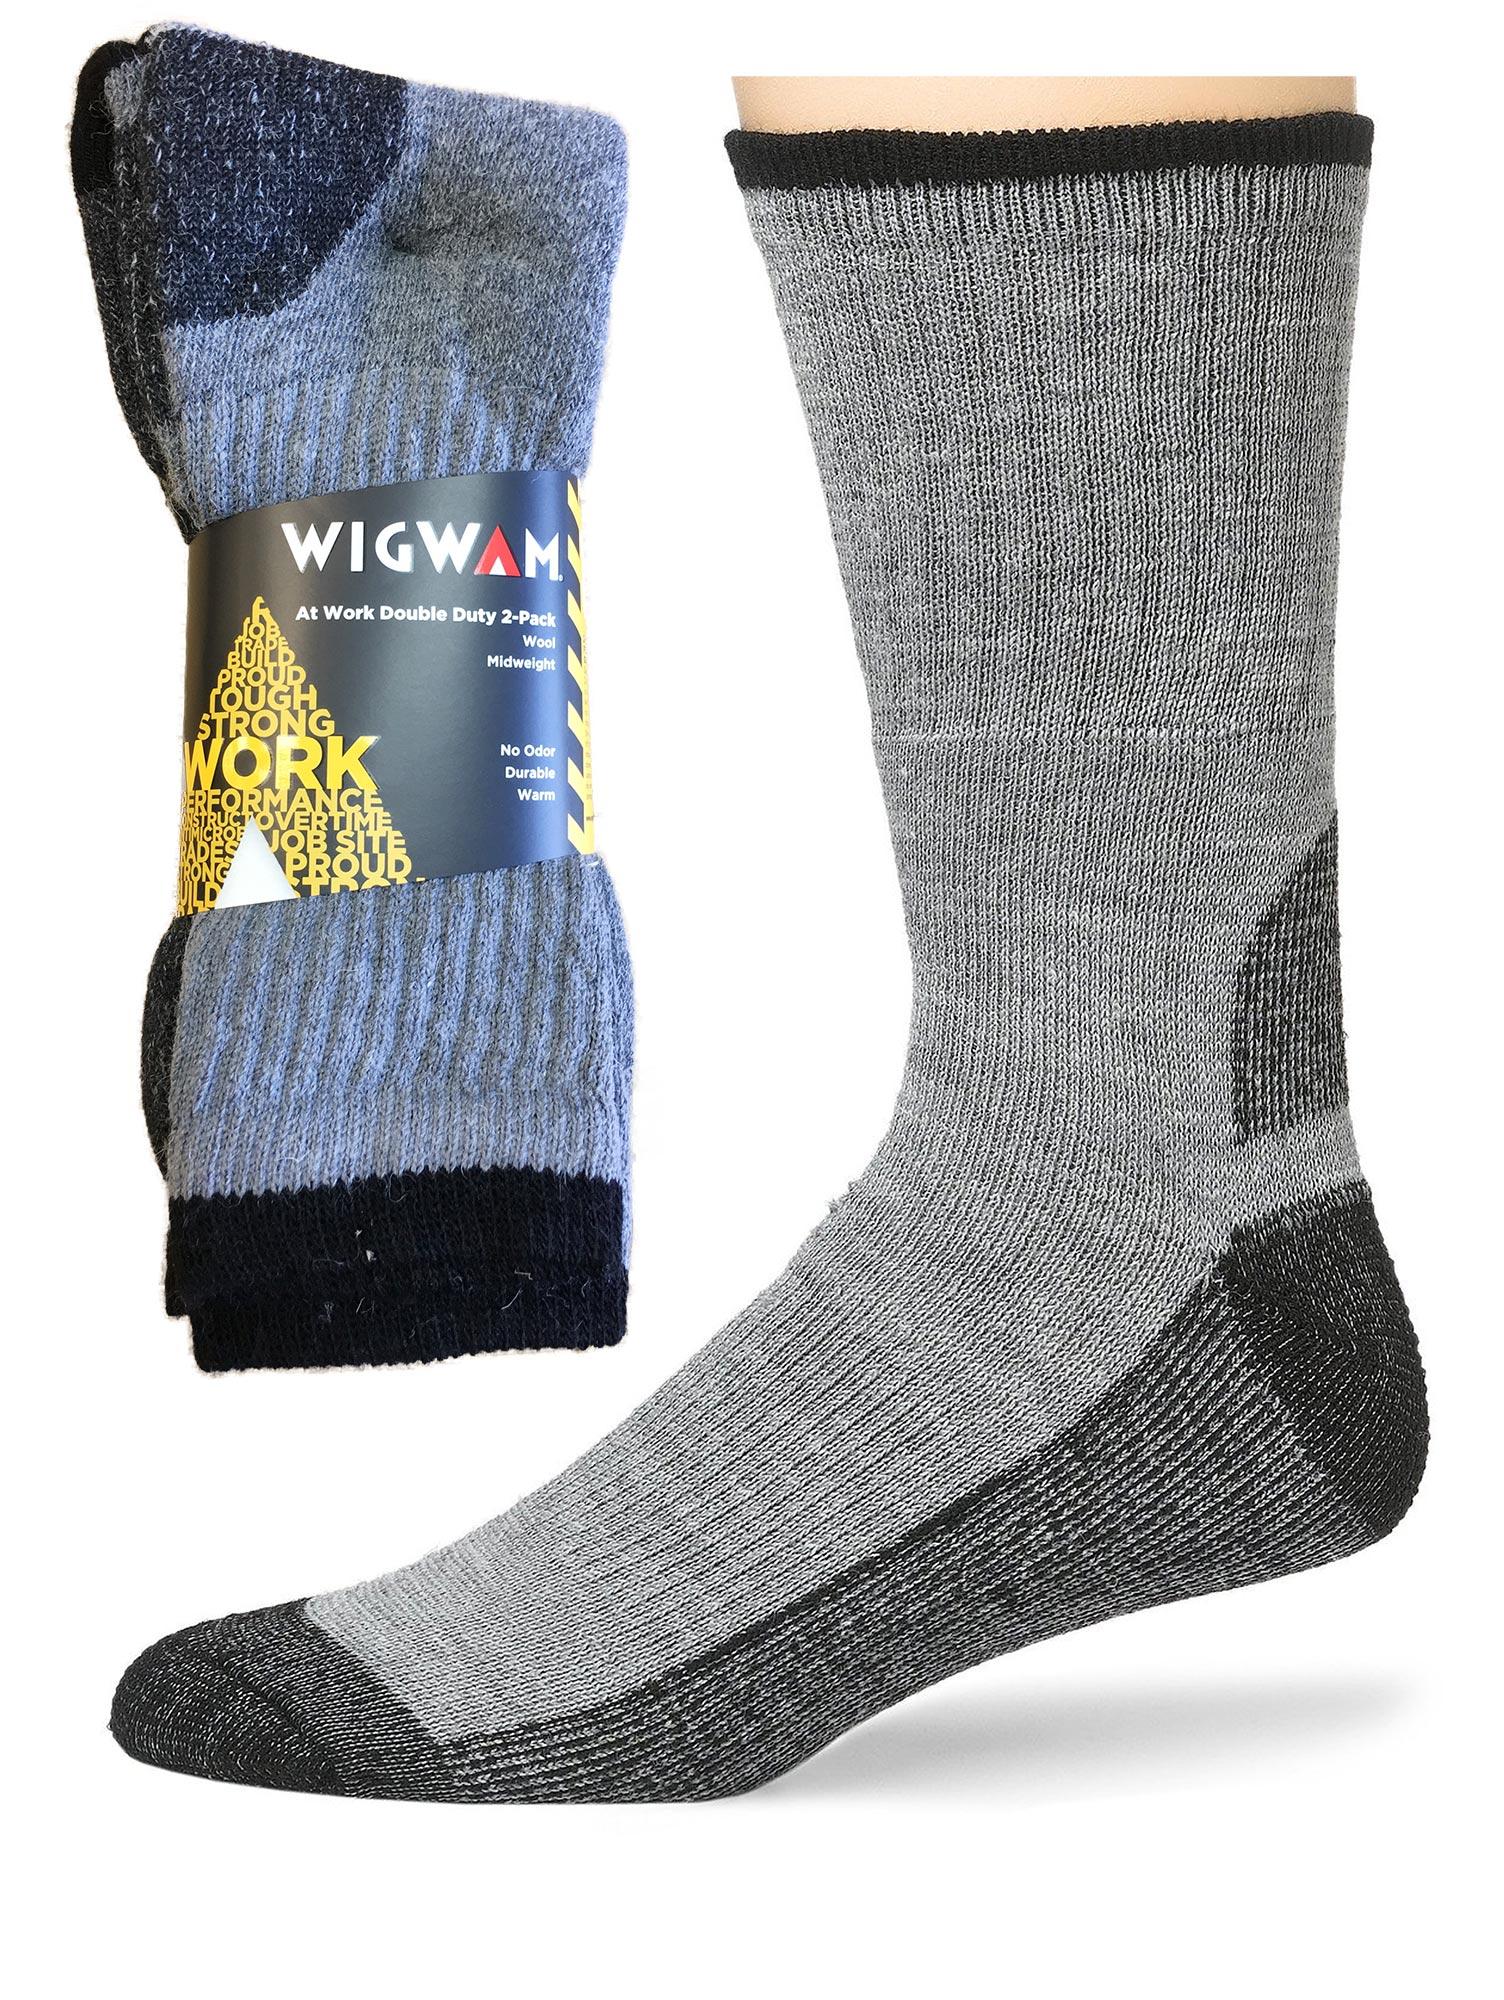 Wigwam At Work Double Duty Socks (2 pack) - S1350